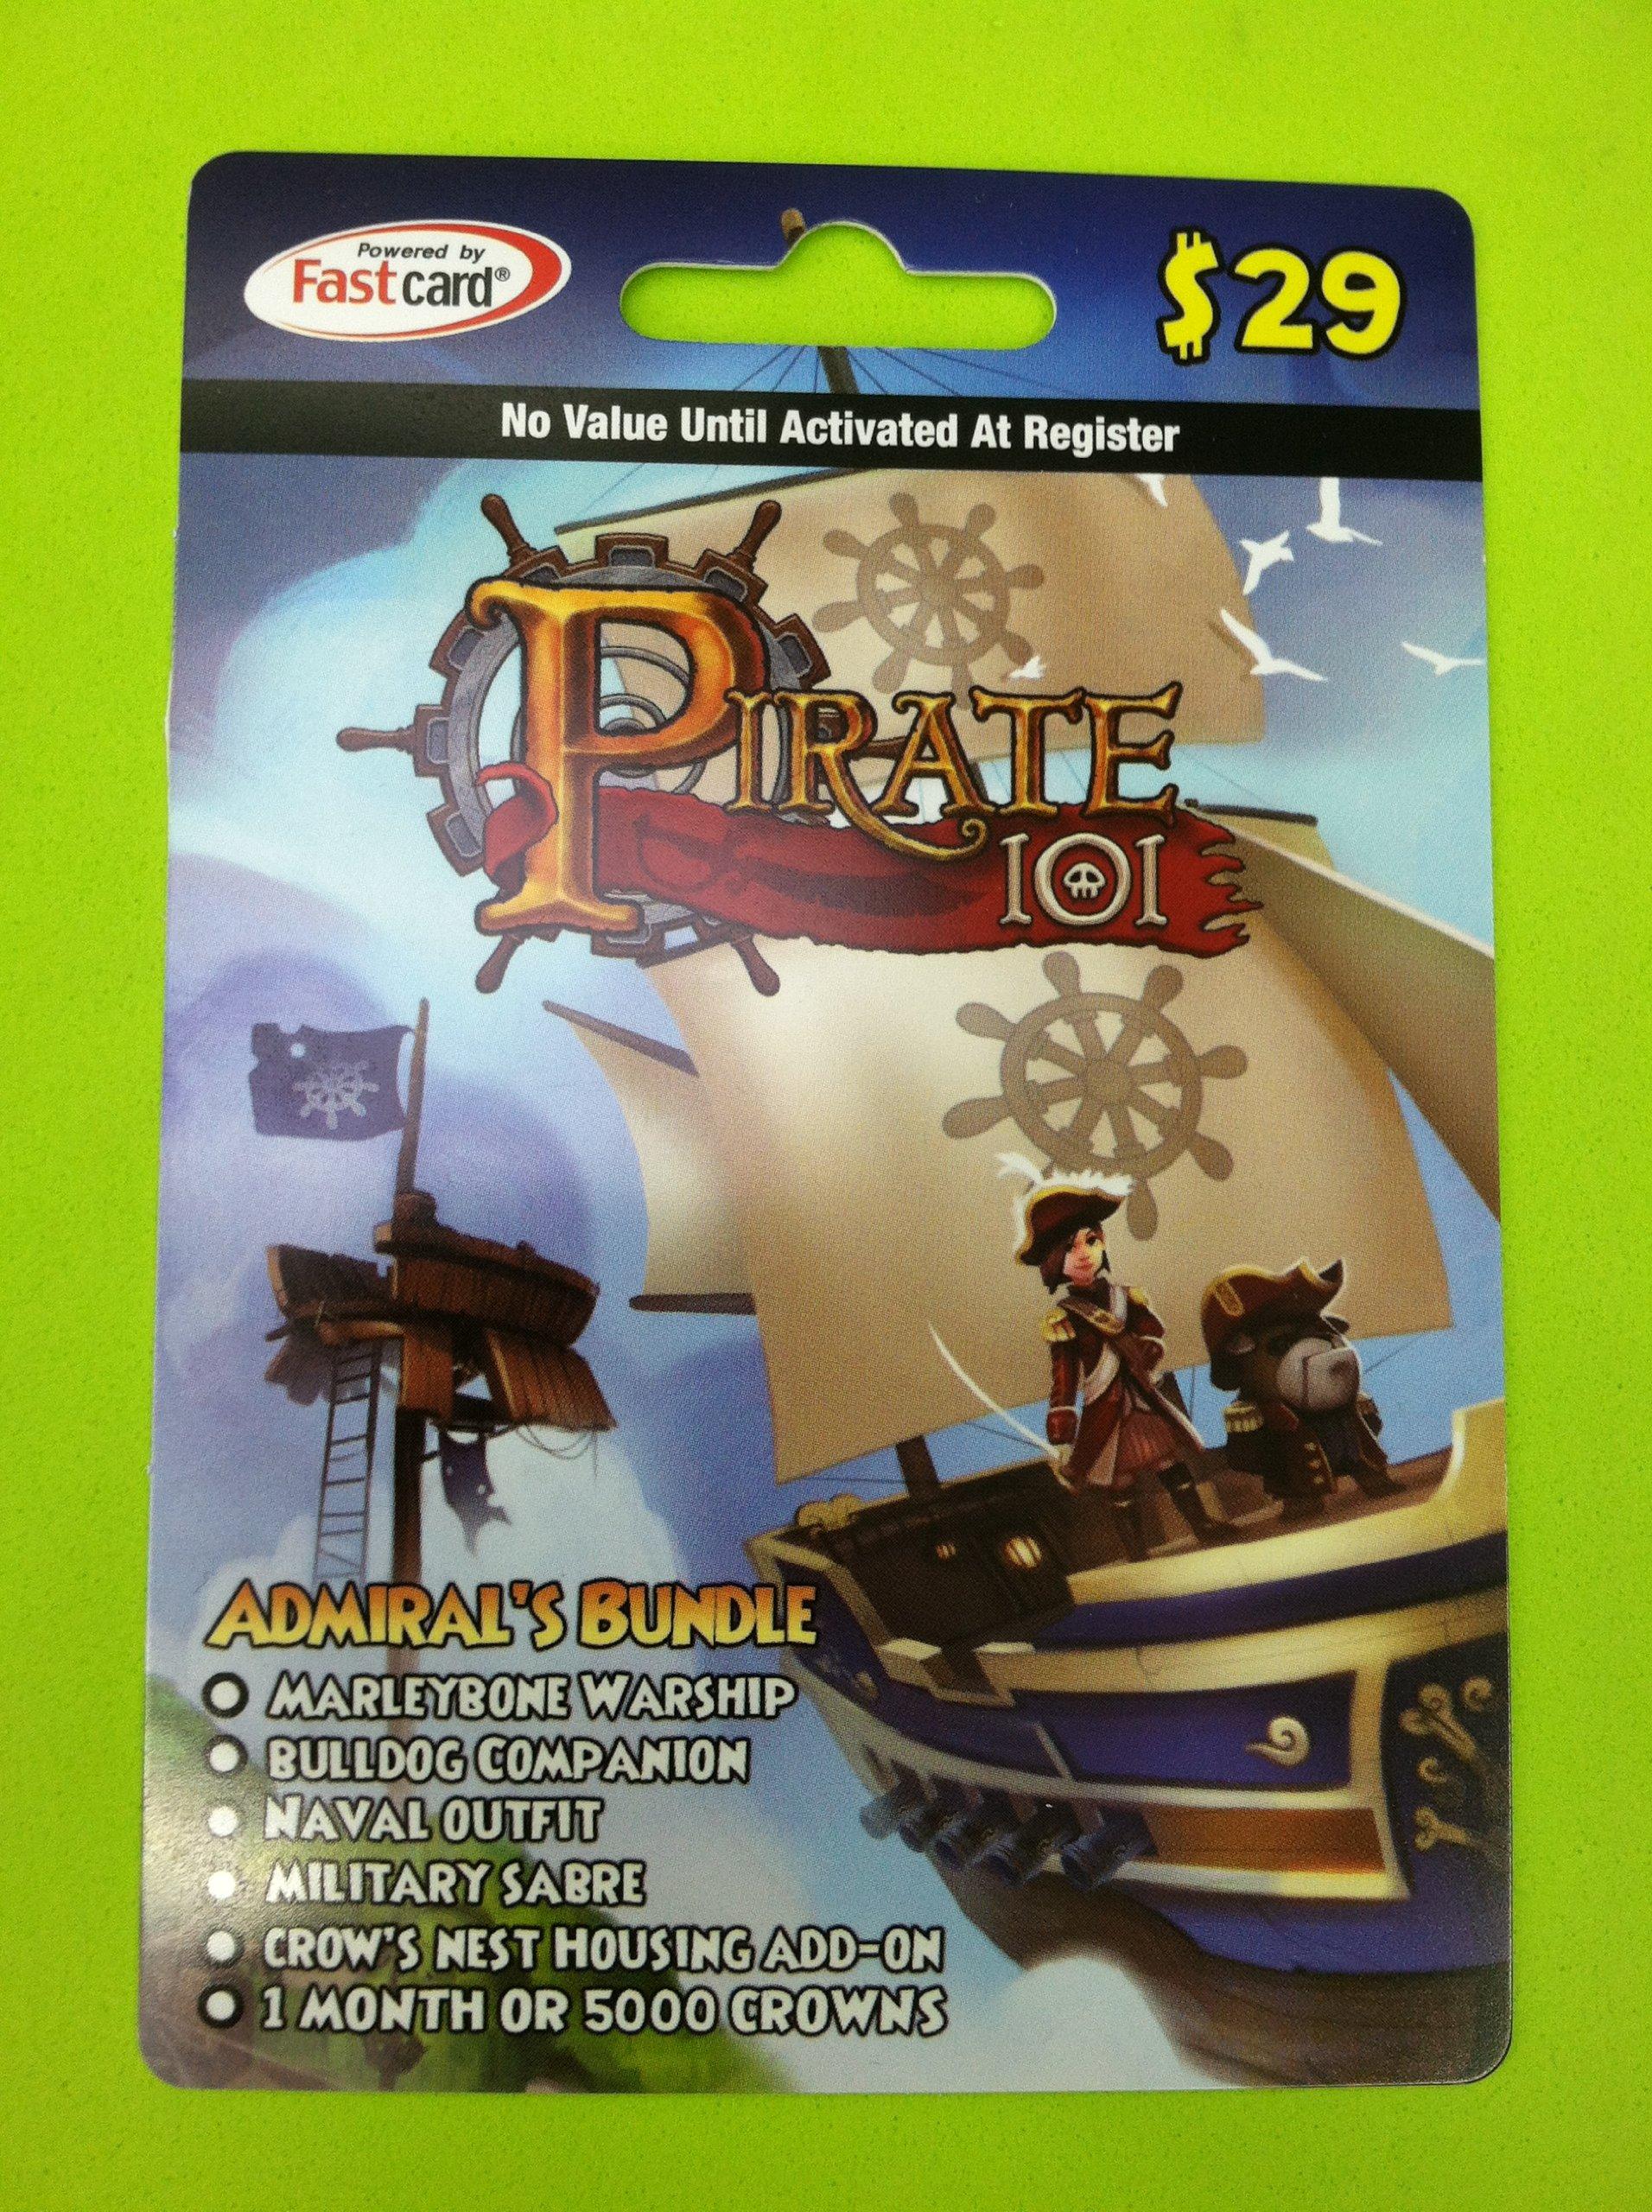 Amazon com: Pirate101 Admiral's Bundle Online Game